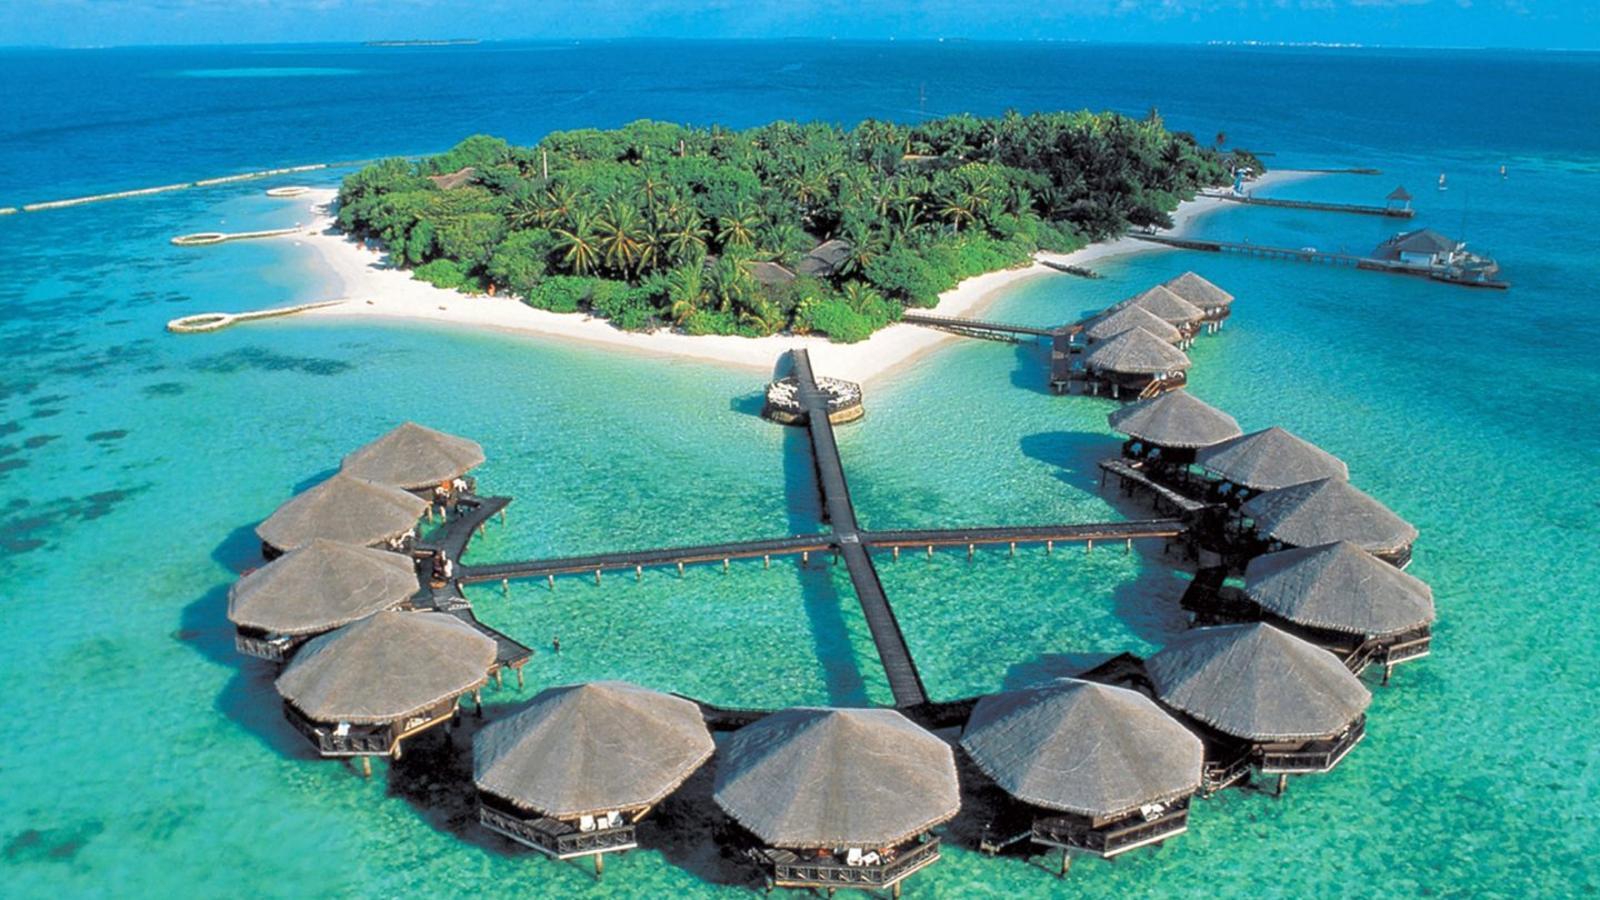 maldives-baros-island-resort_edl7bi